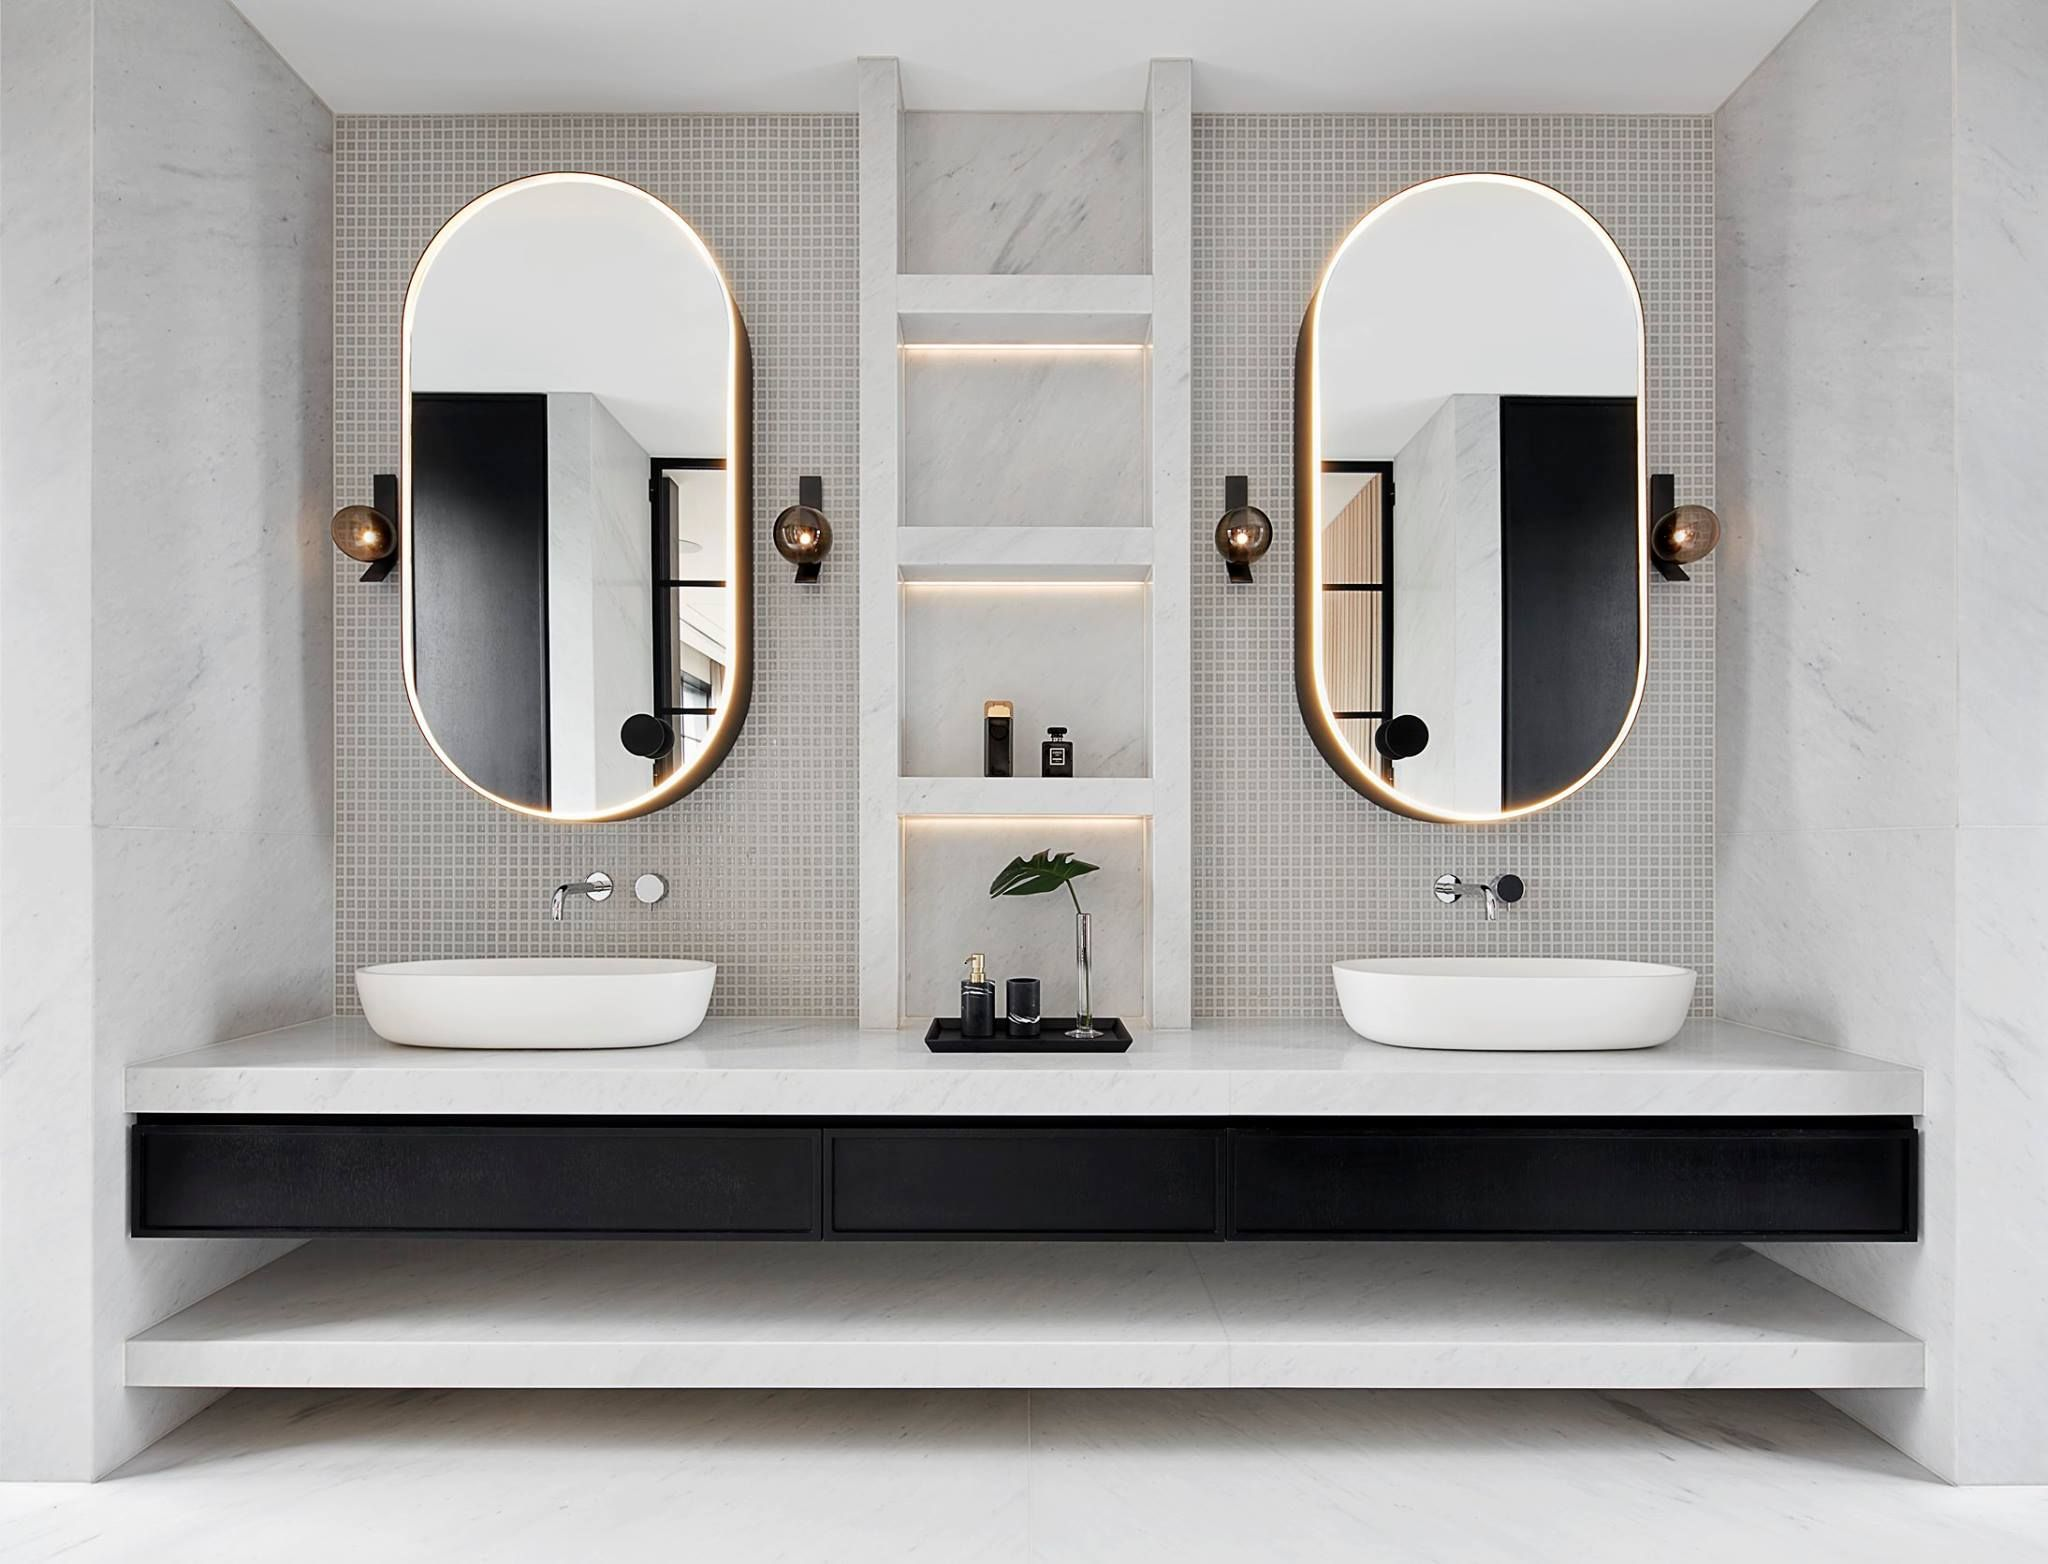 COCOON marble bathroom bycocoon.com | marble bathroom design ...